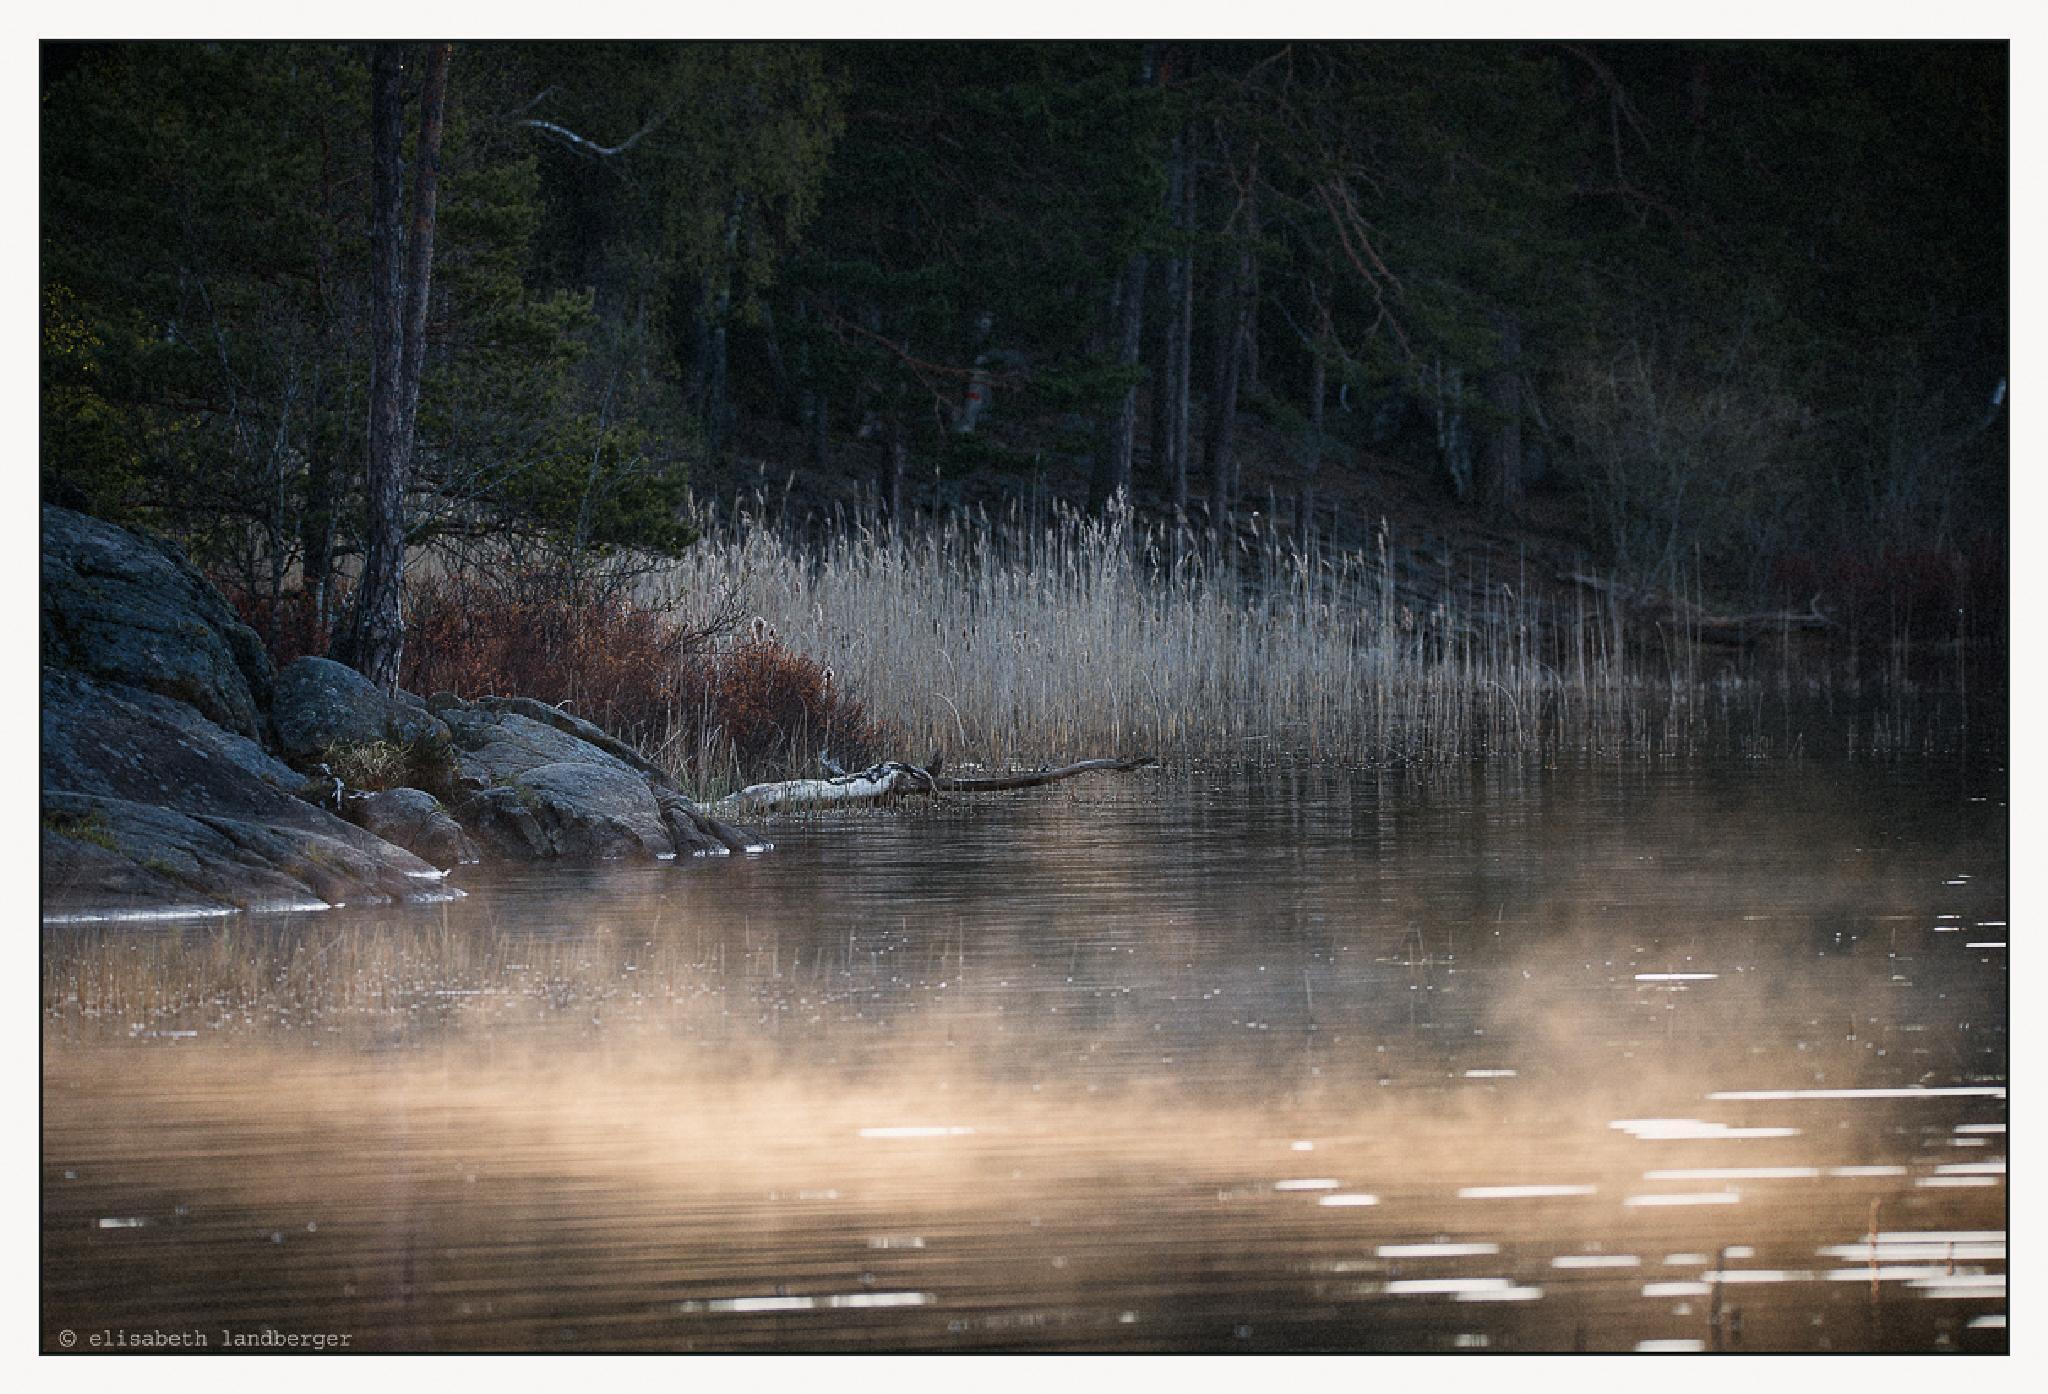 Morning by Lake Gommaren by Elisabeth Landberger